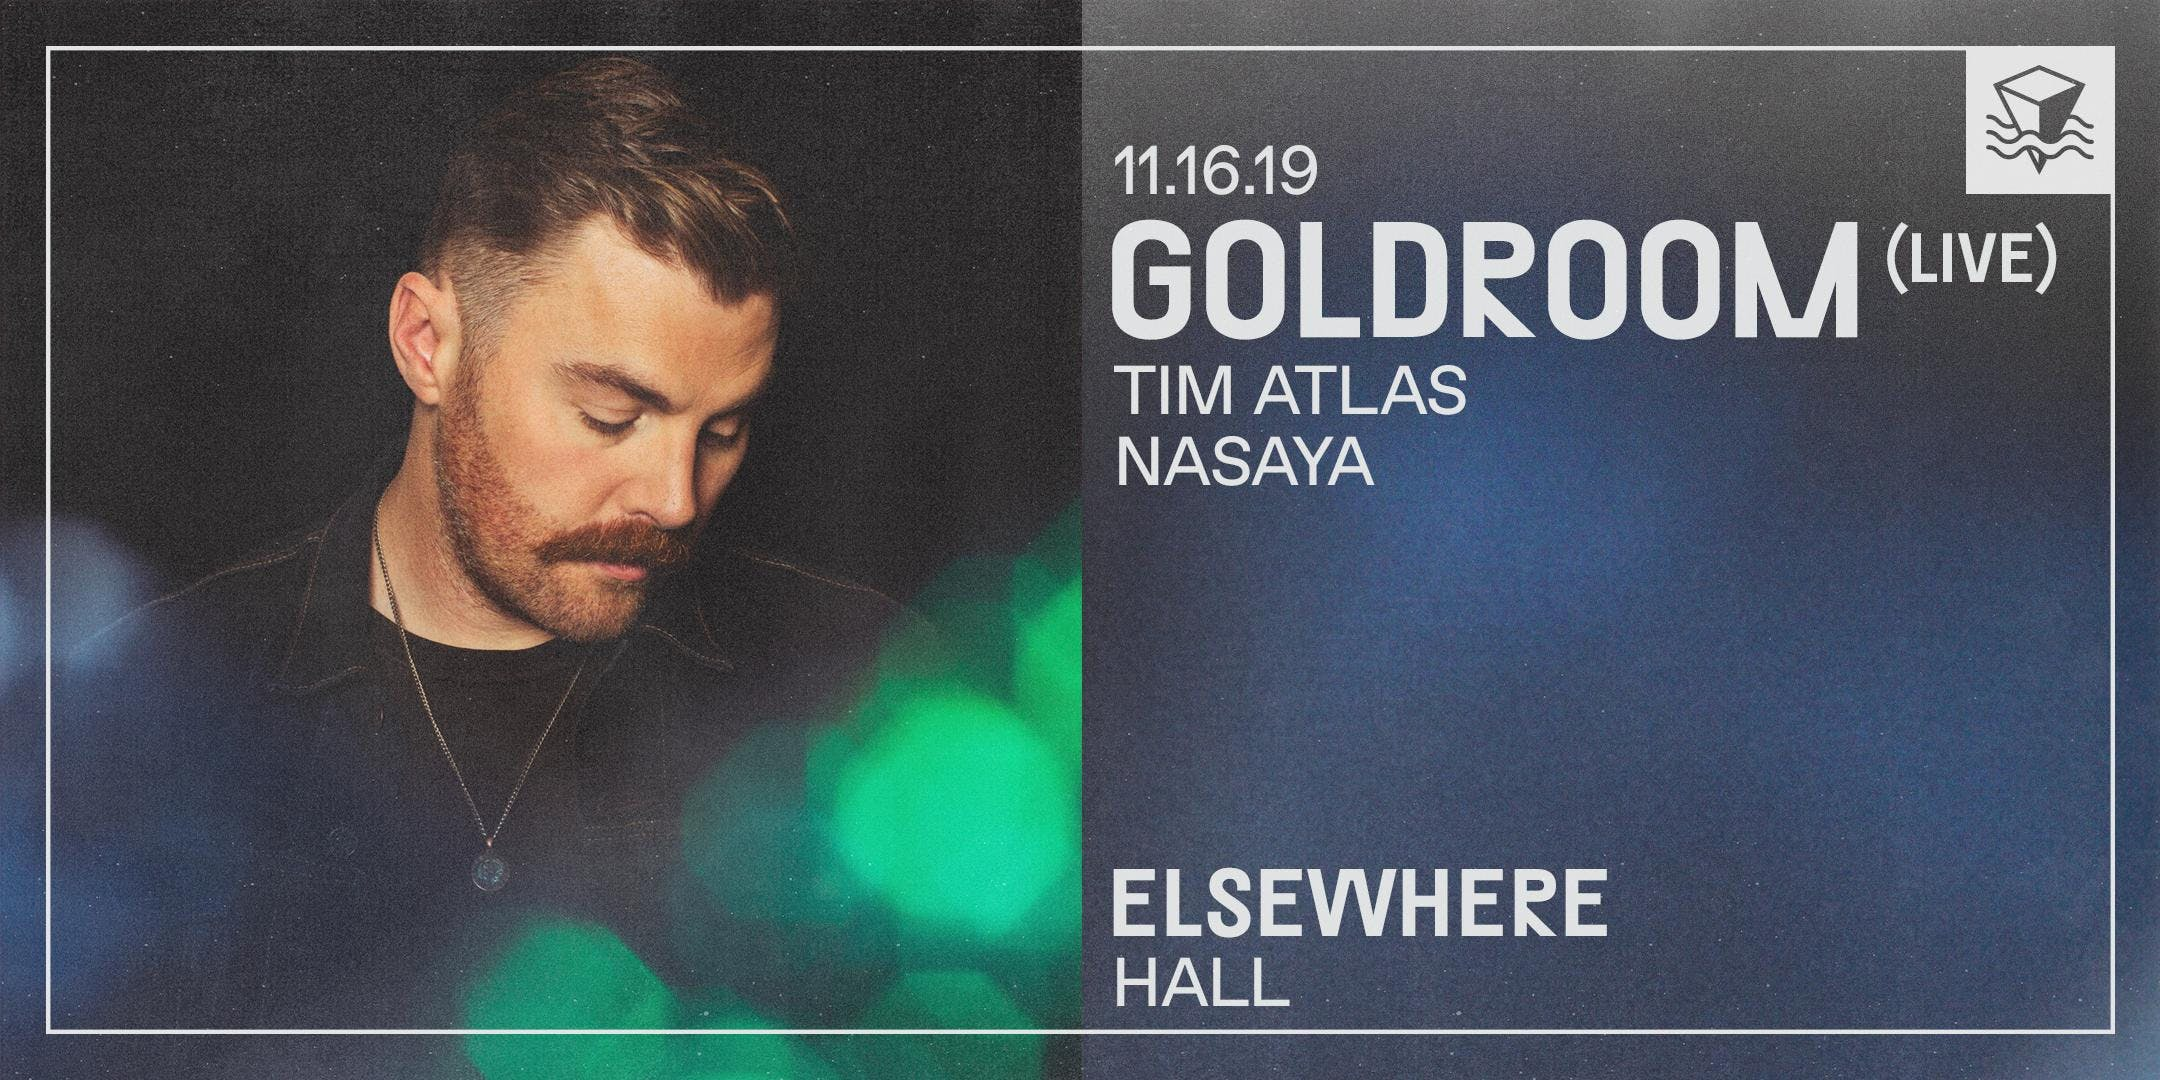 Goldroom (Live)